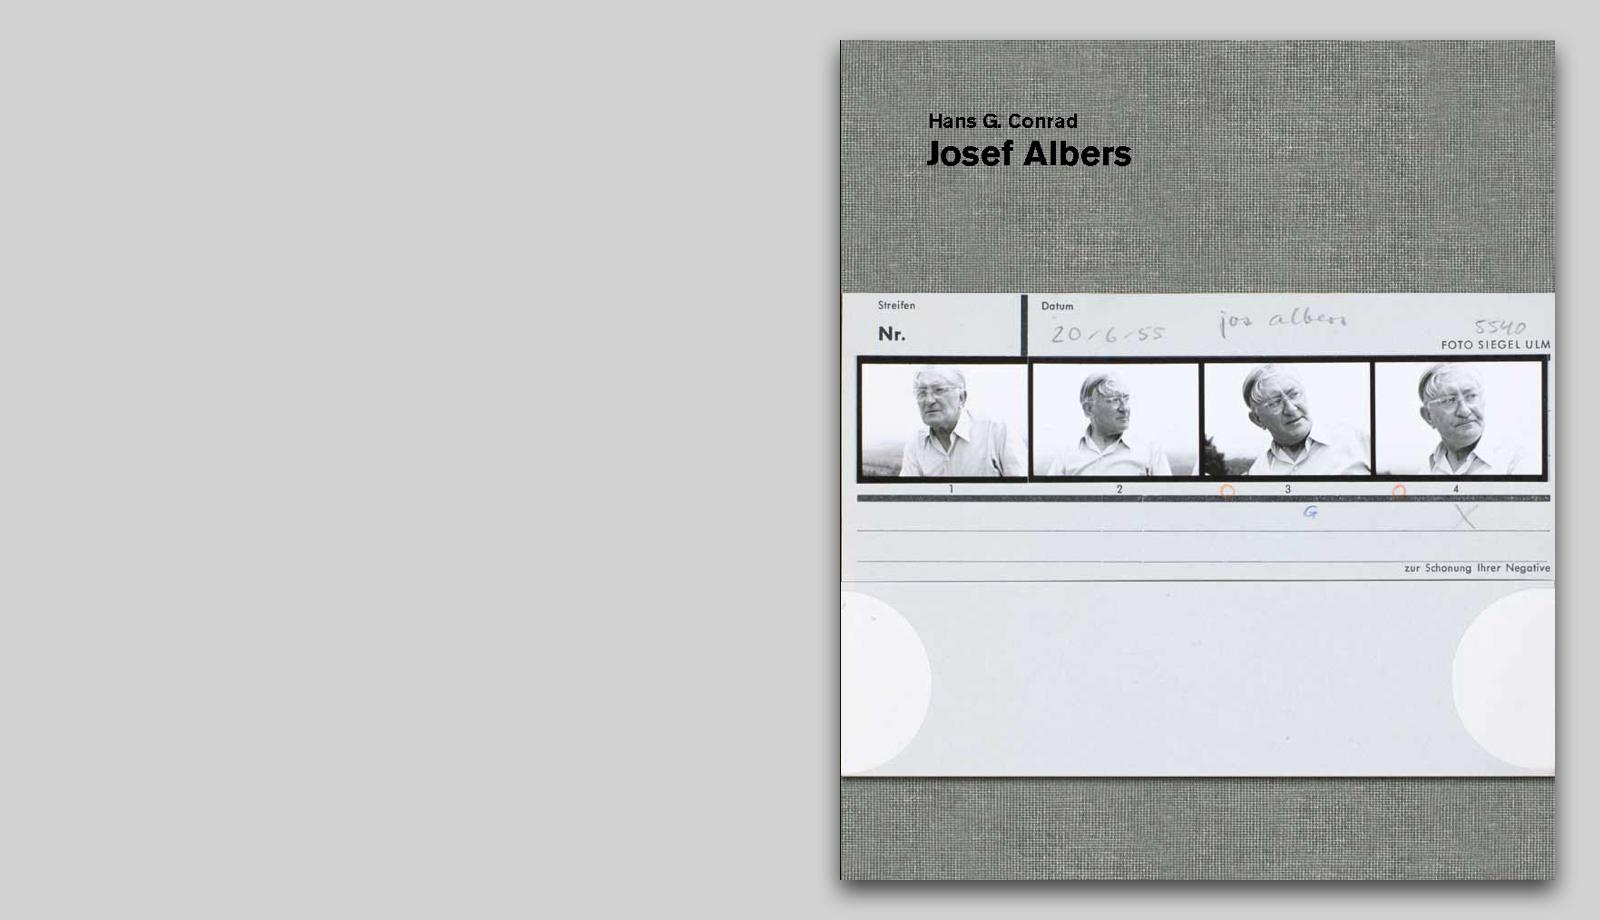 180601_ReneSpitz_HansGConrad_Edition 1_Josef Albers_01